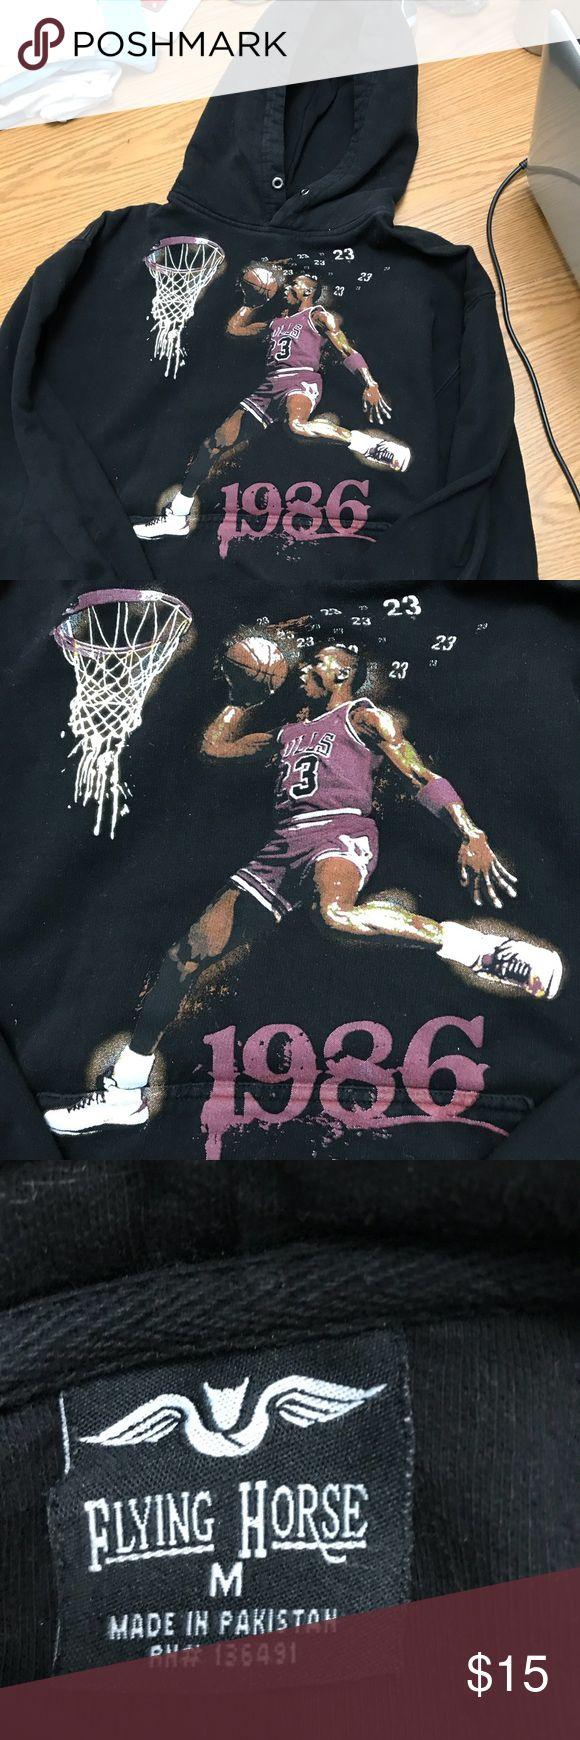 Boys Med hoodie with Michael Jordan 1986 print EUC 61 Flying Horse Shirts & Tops Sweatshirts & Hoodies